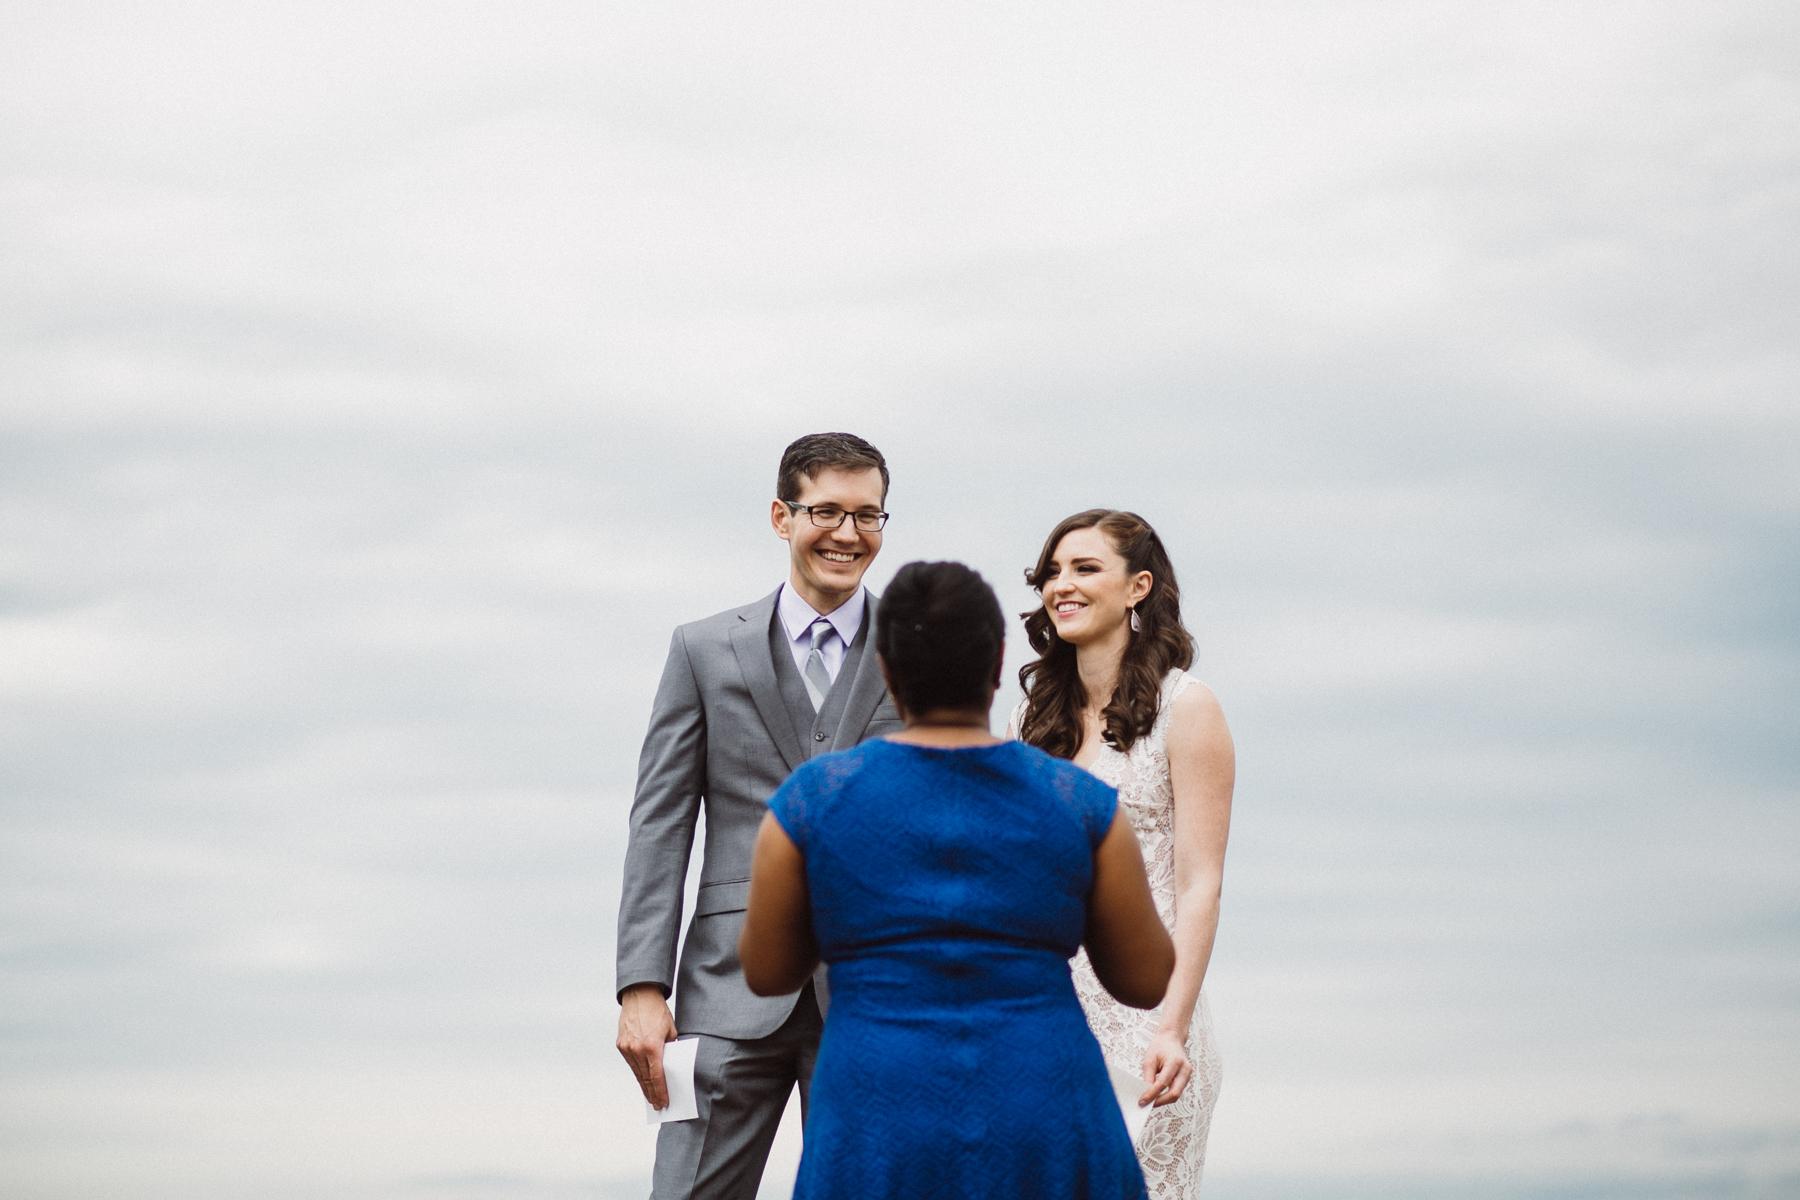 elopement in austin texas